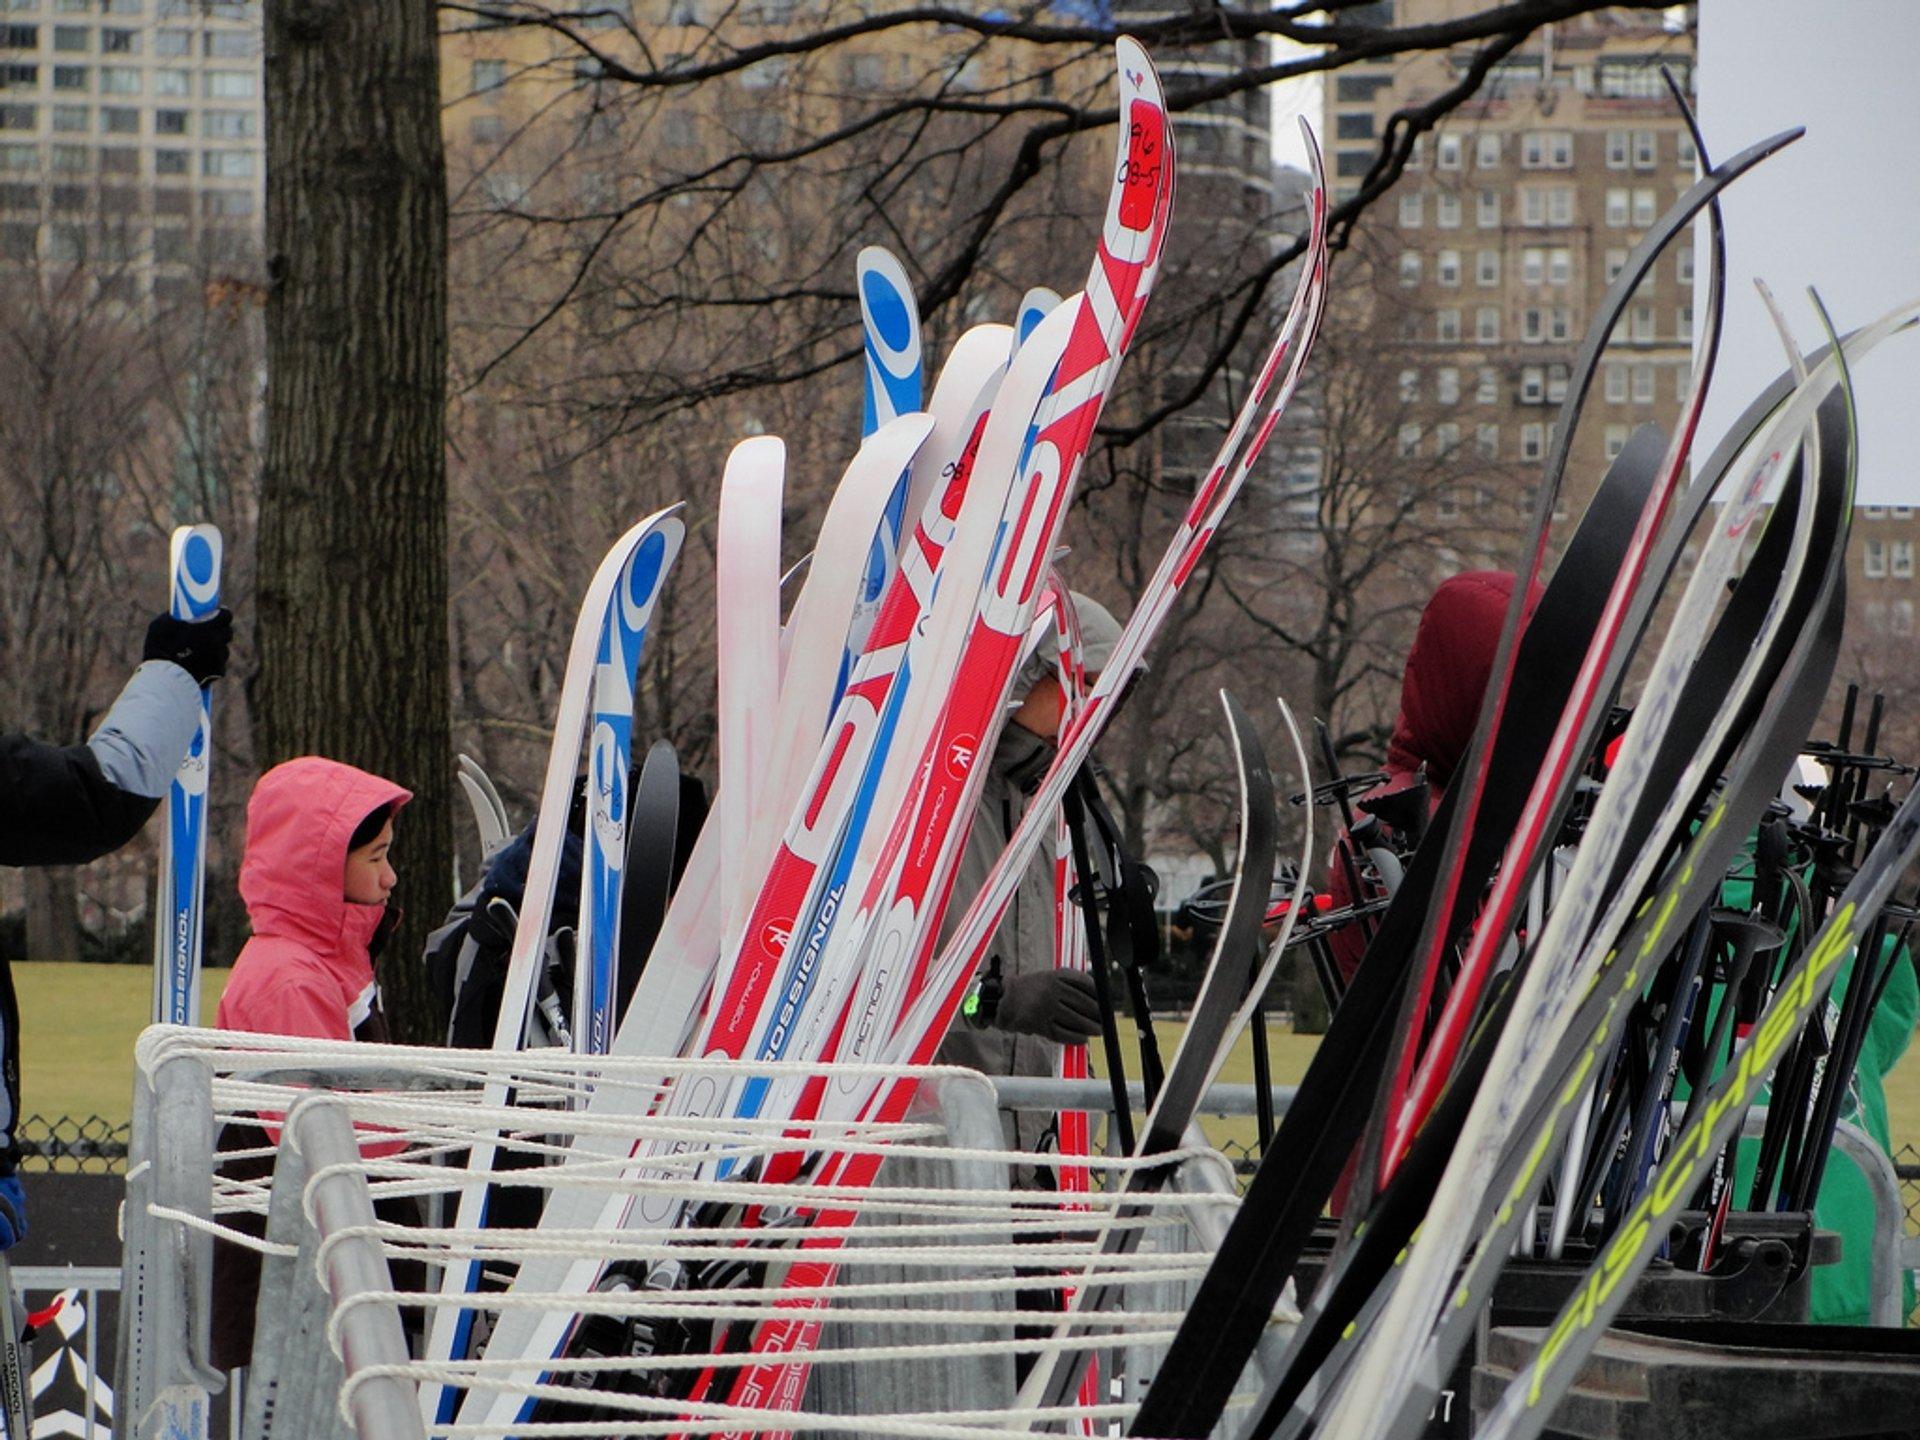 Ski rack 2020